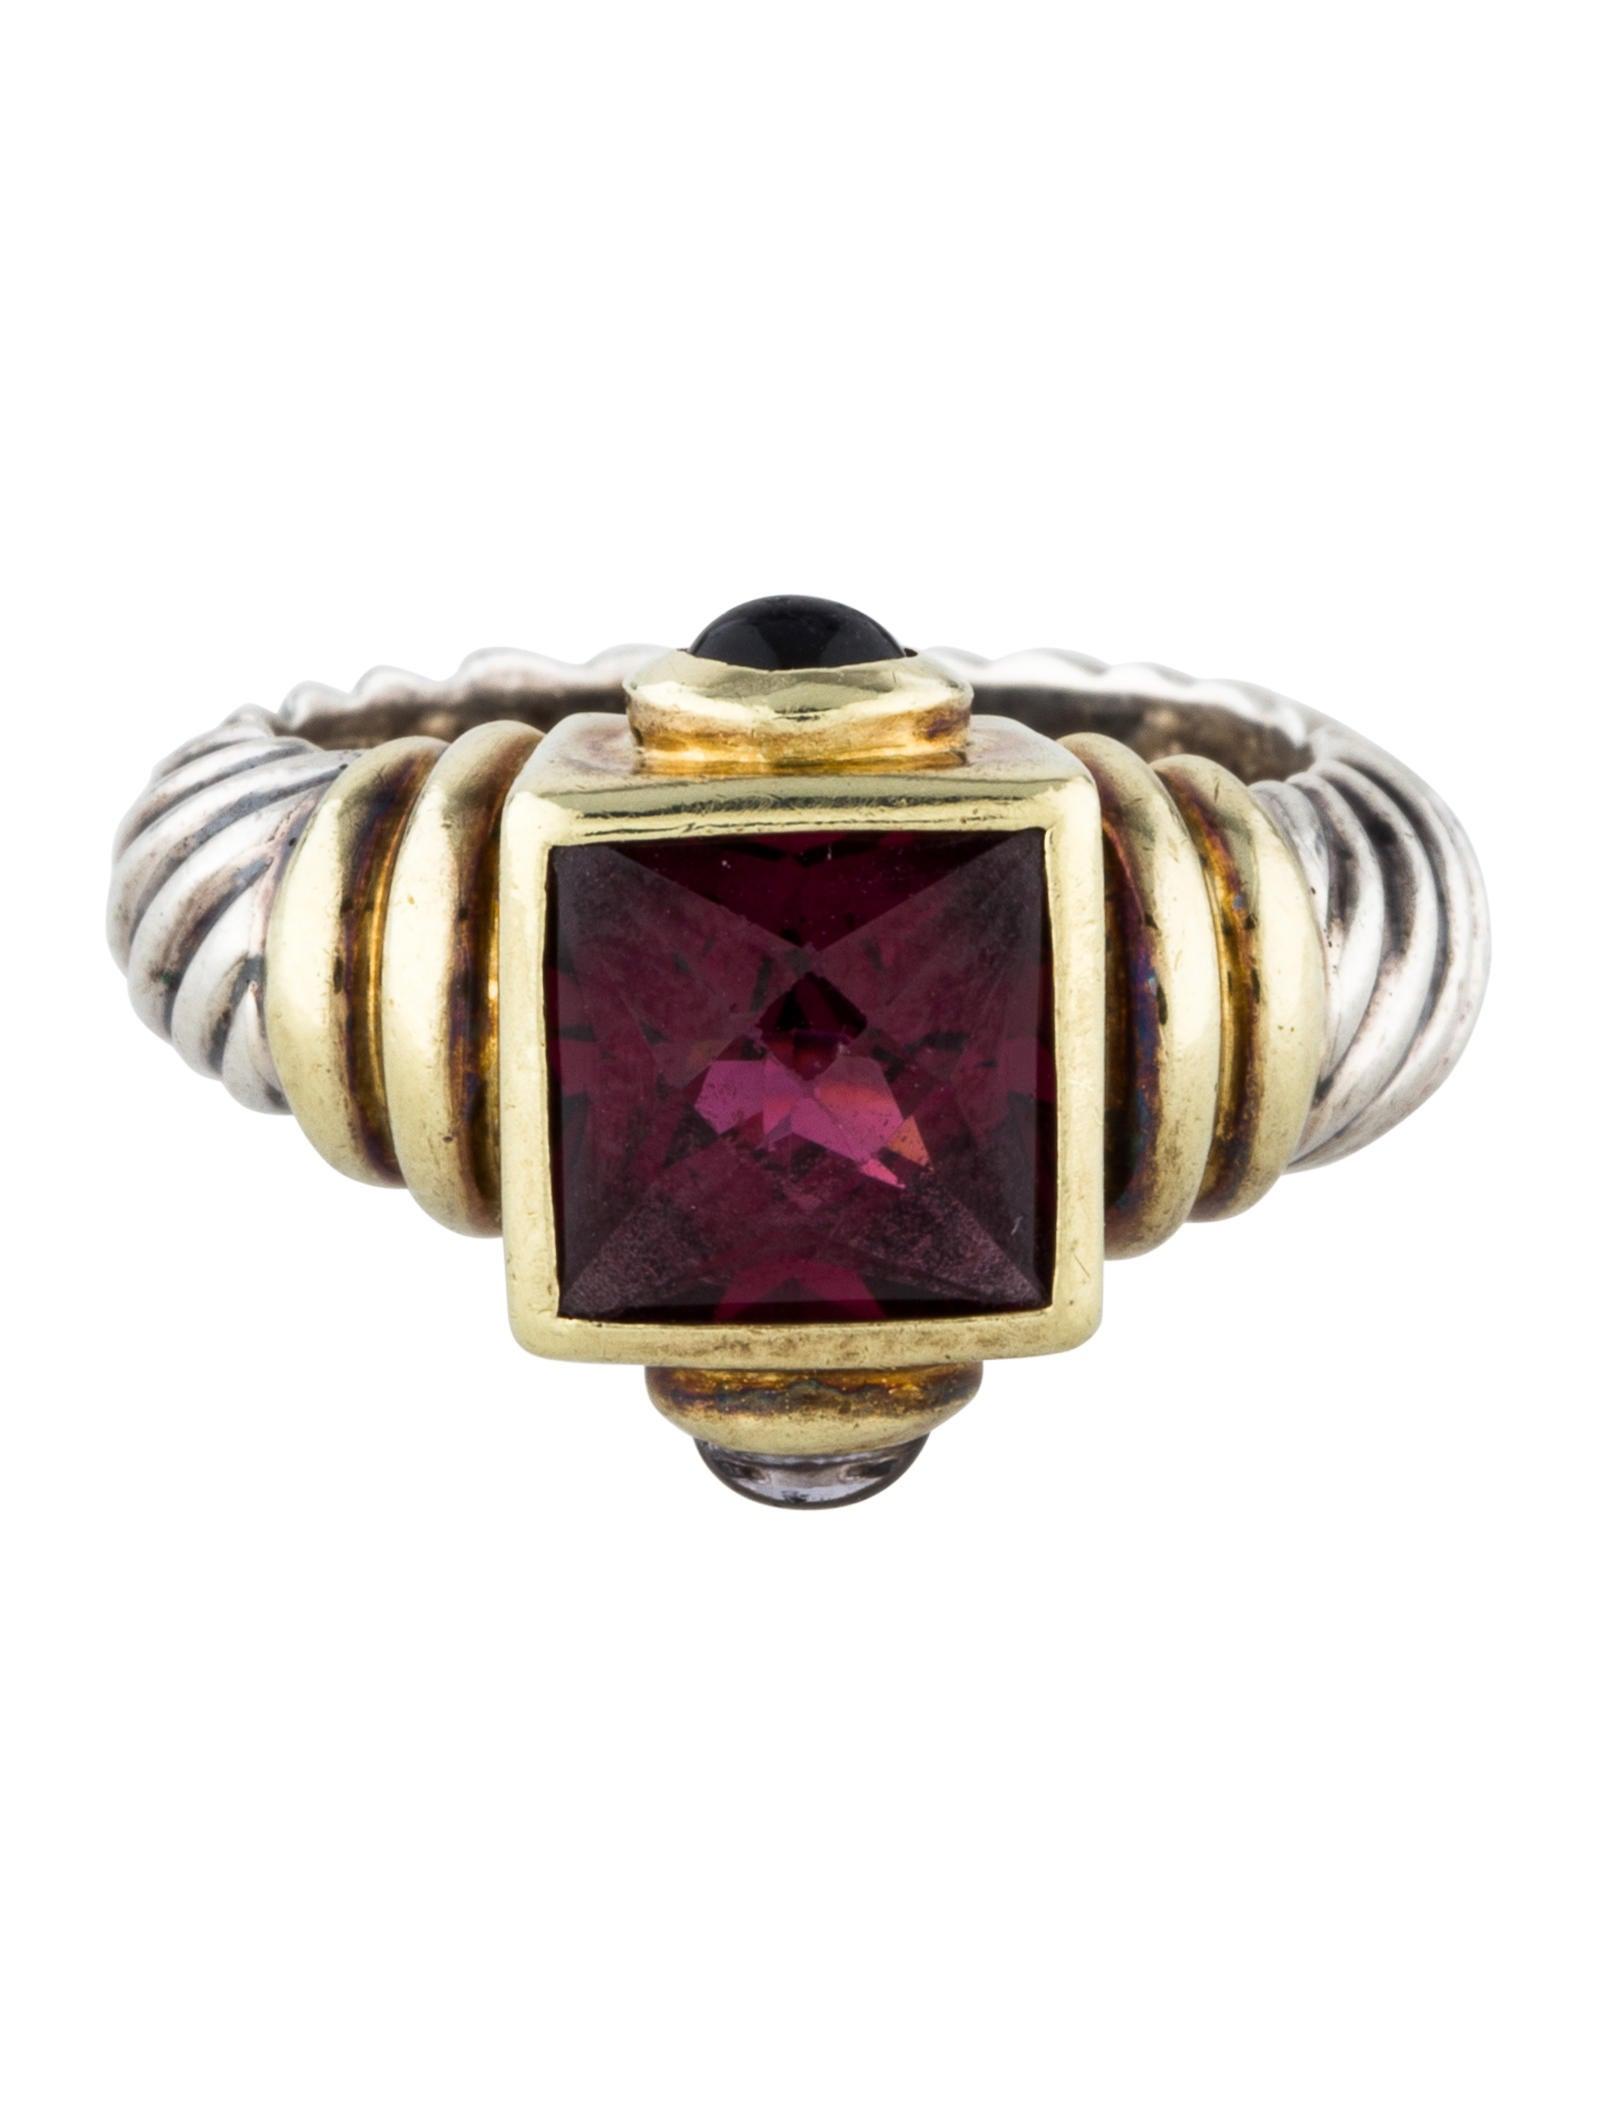 David yurman tourmaline iolite renaissance ring rings for David yurman inspired jewelry rings